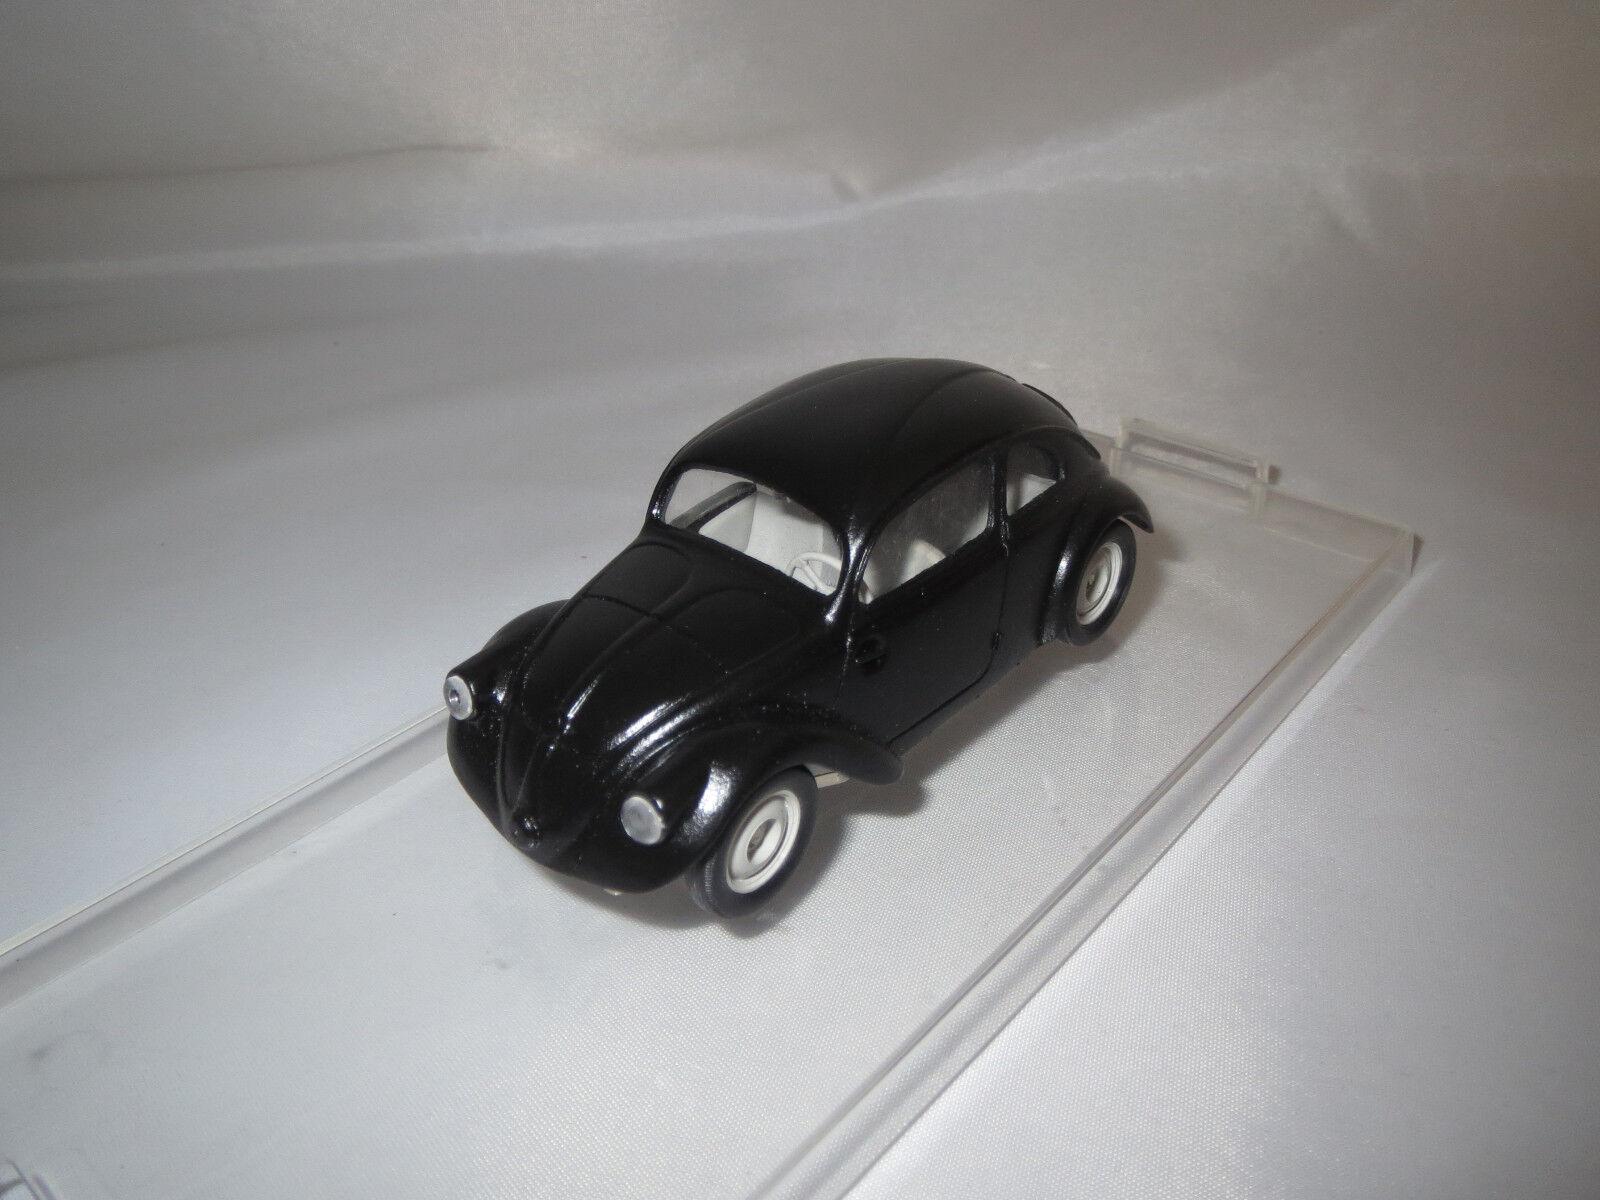 Kager volkswagen coccinelle (Noir) 1 43 OVP